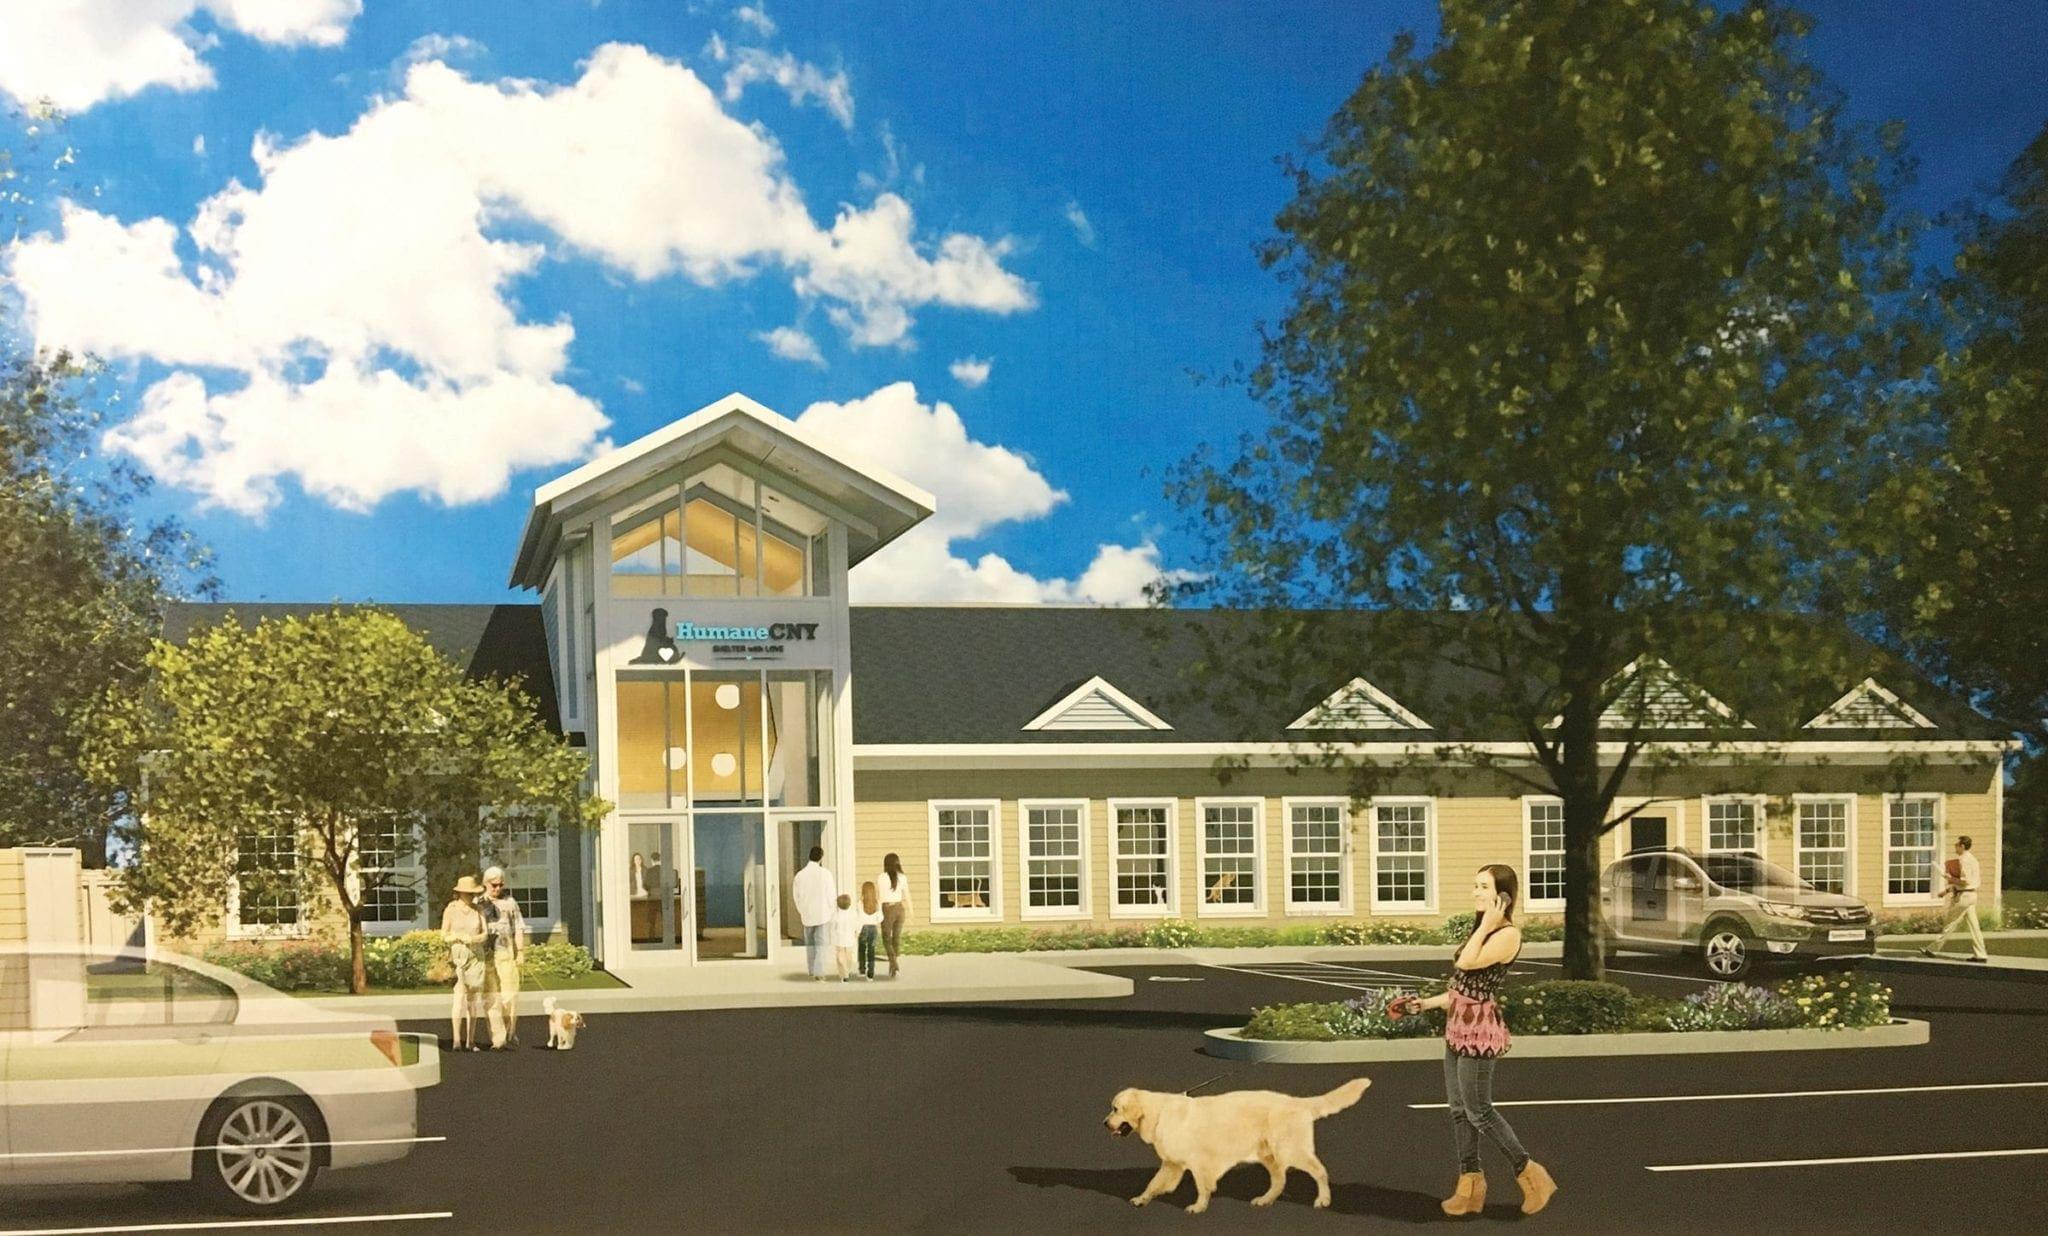 In the doghouse: HumaneCNY raising money for $2 million shelter renovation